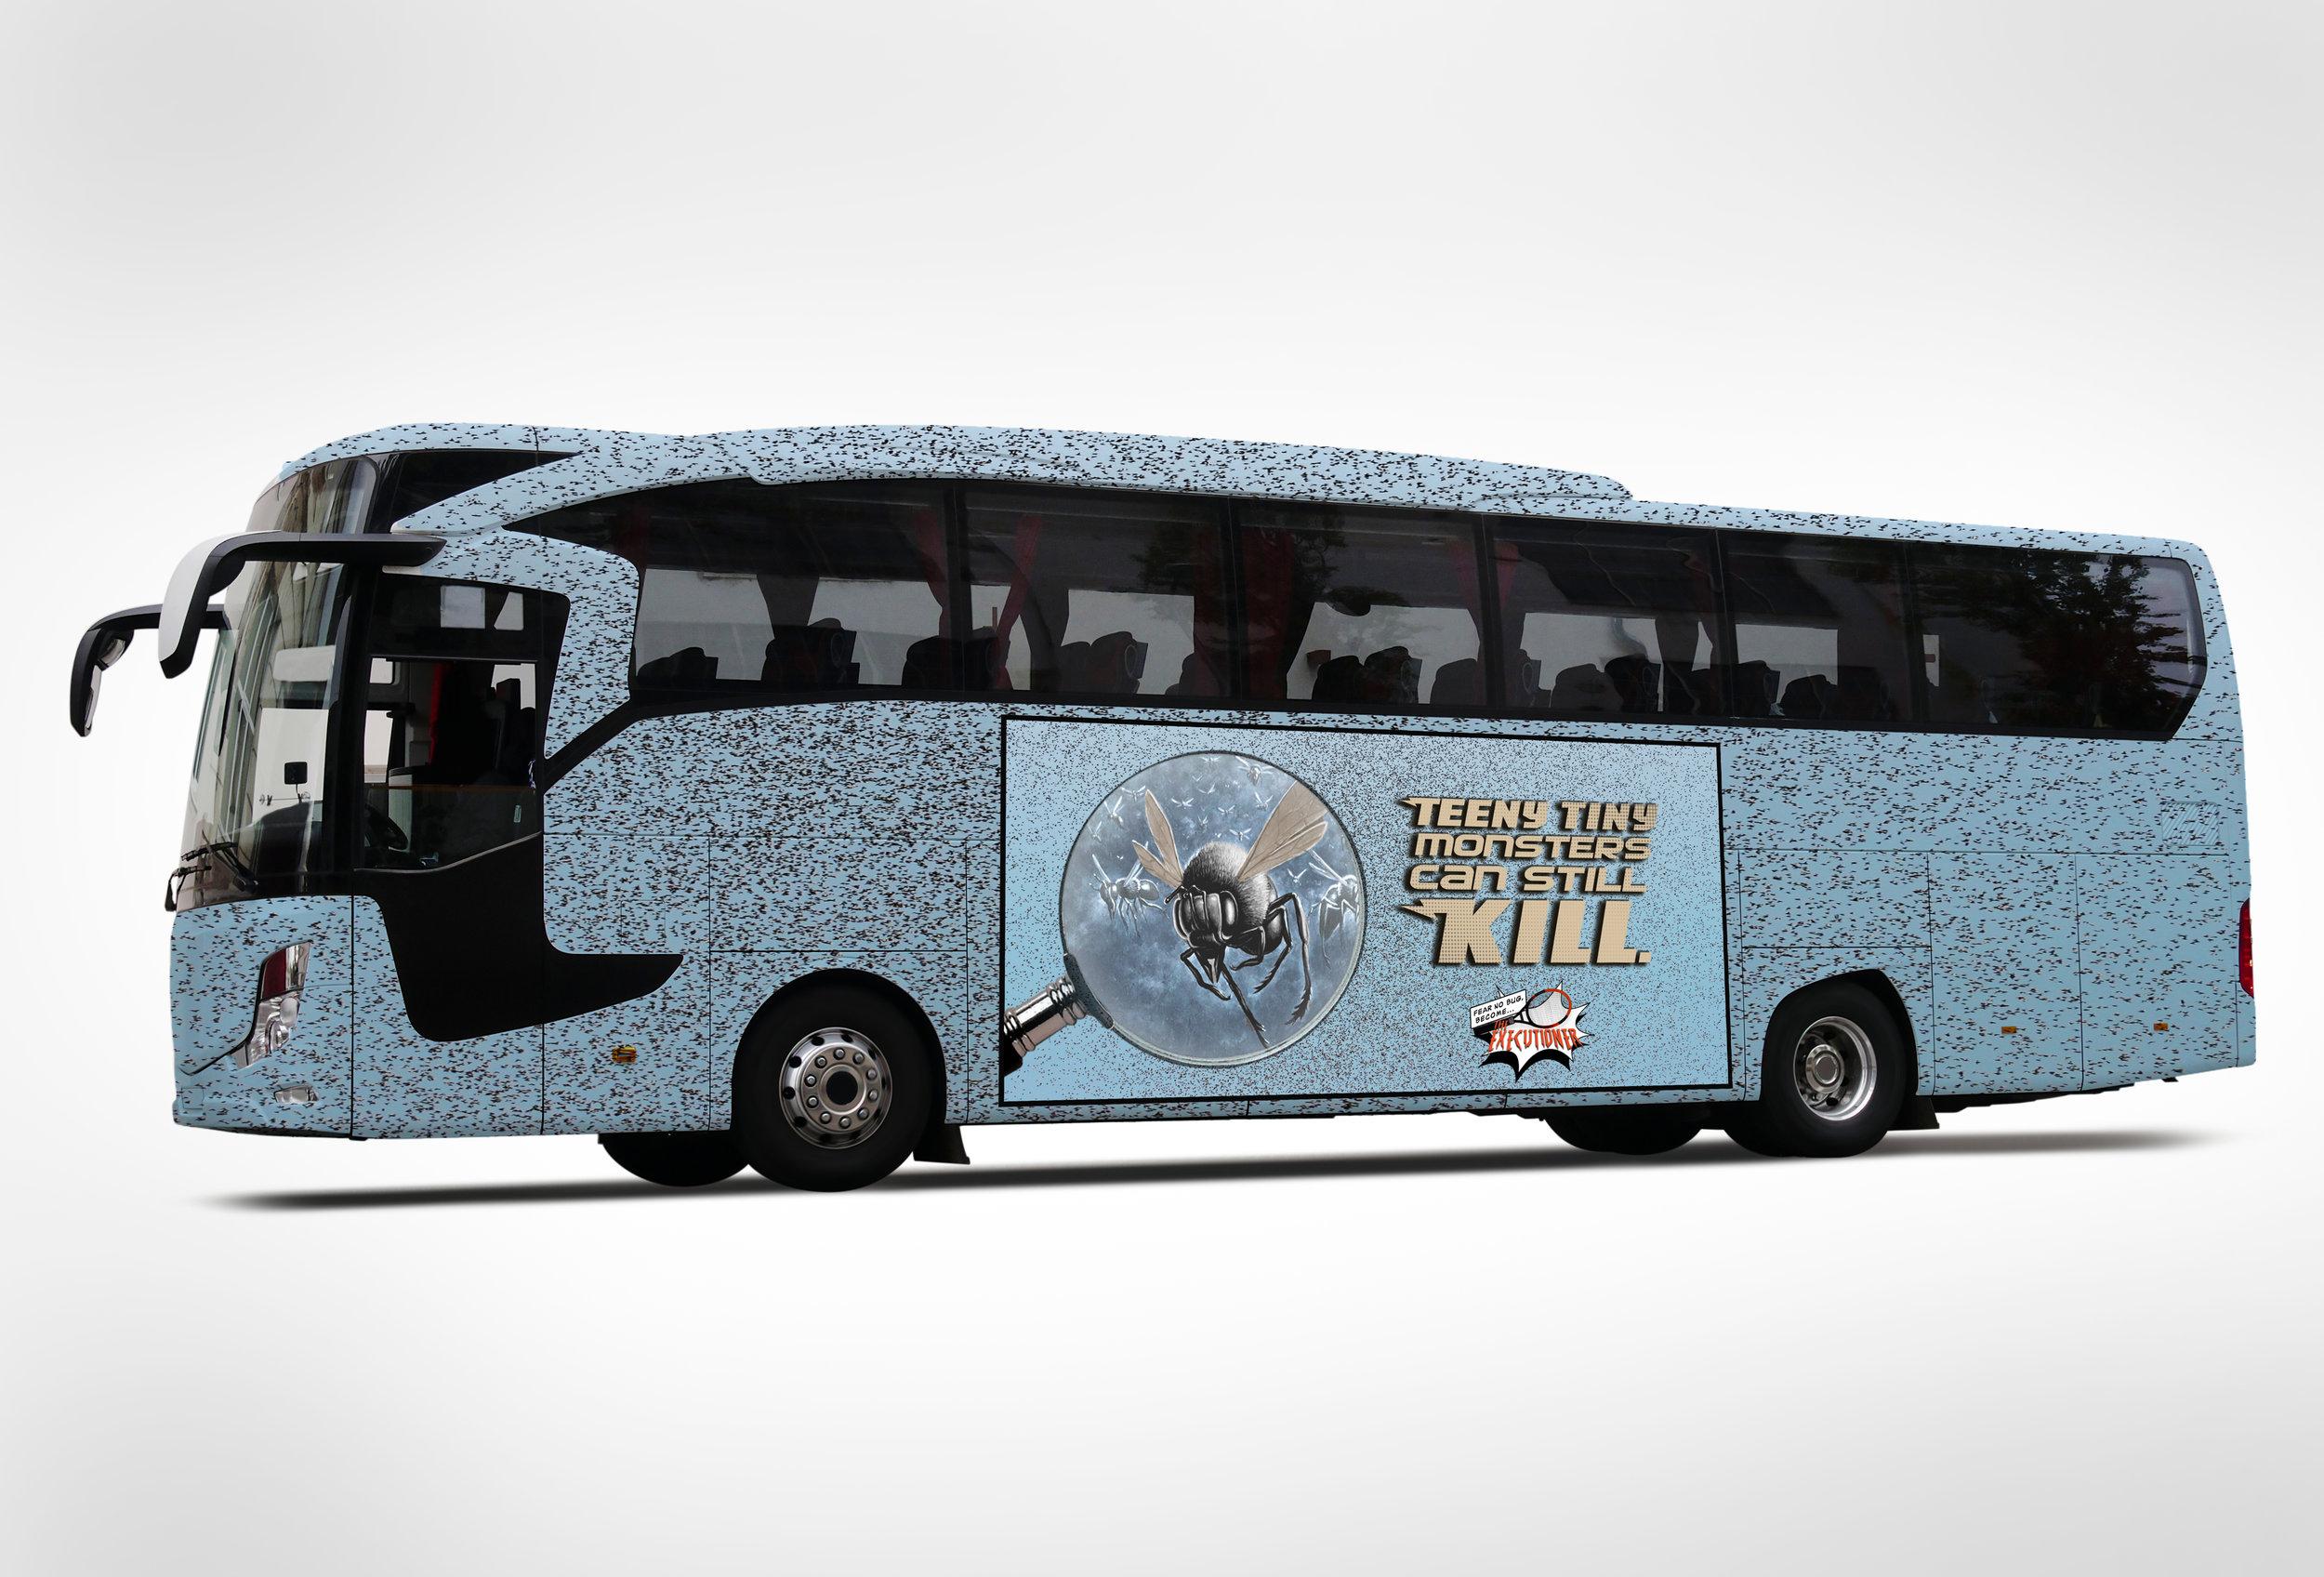 final bus zap.jpg